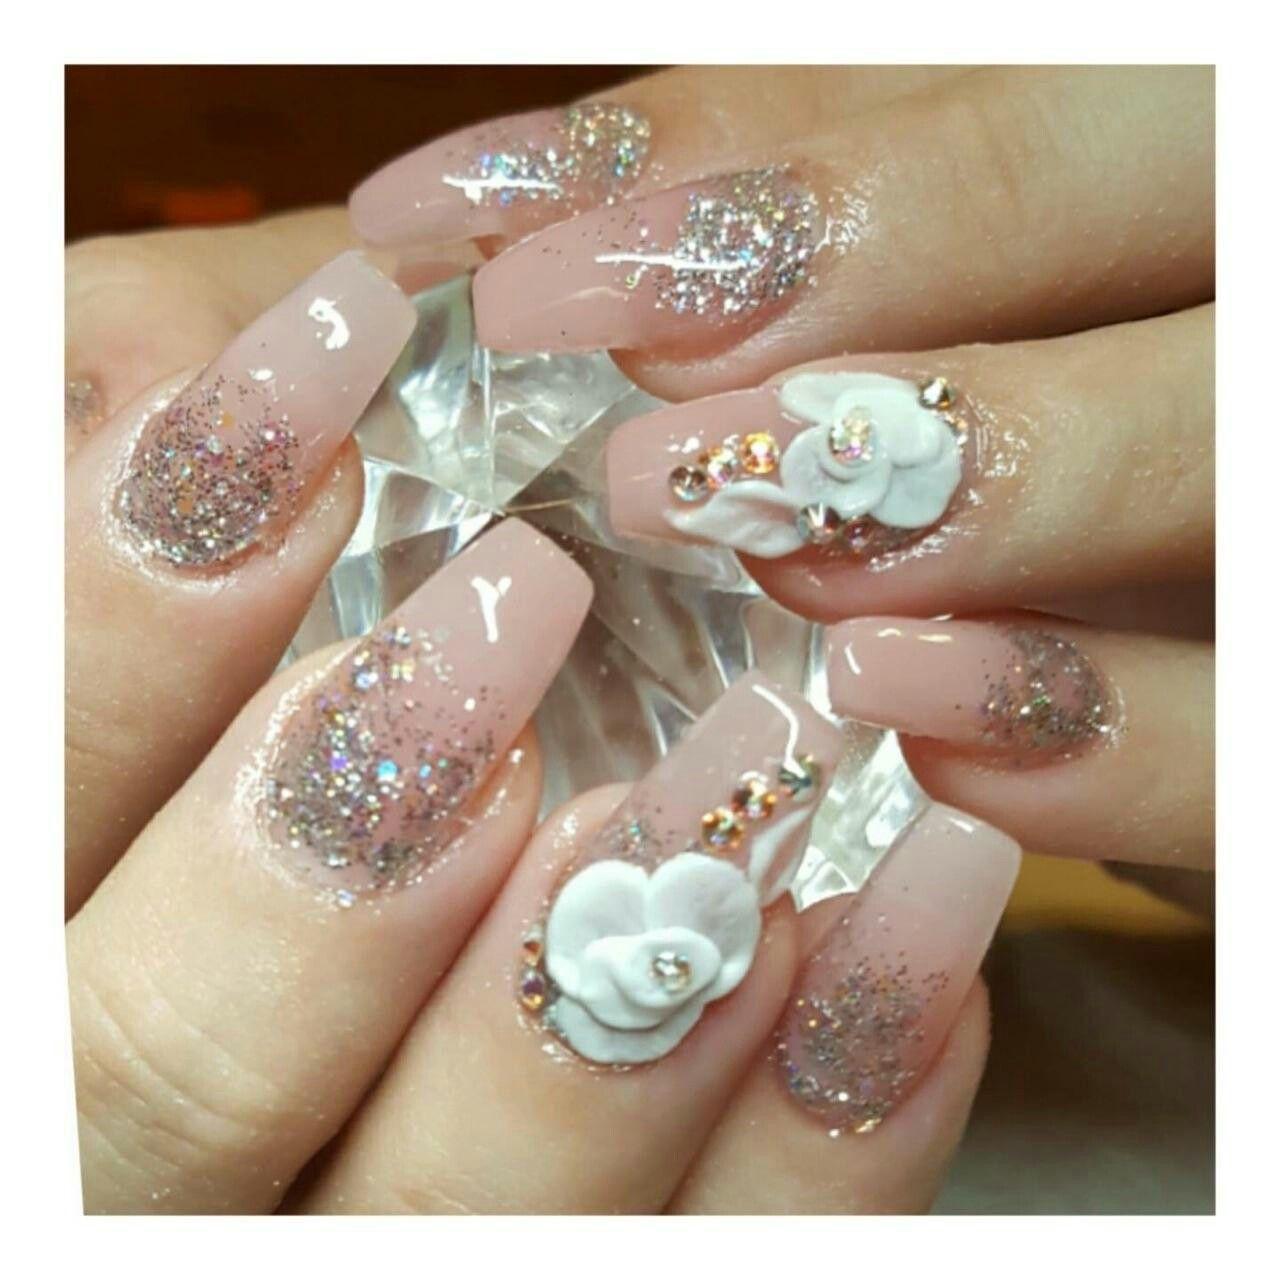 I love my nails | nail designs | Pinterest | Gorgeous nails